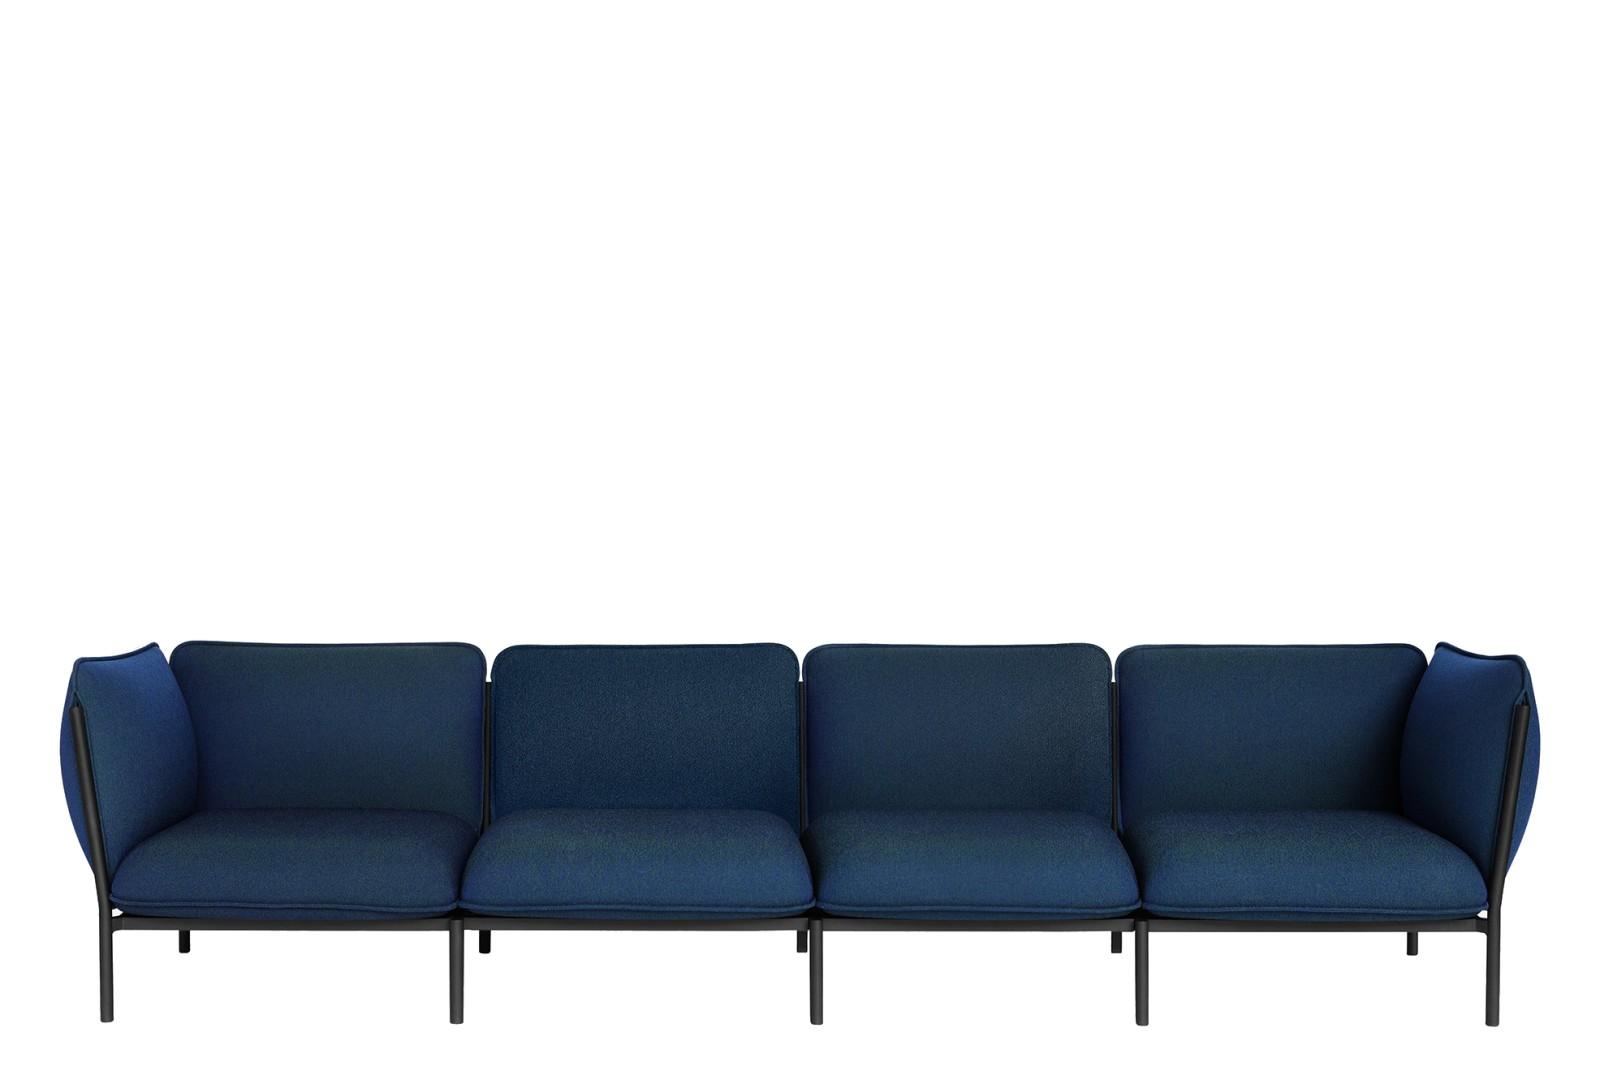 Kumo Modular 4-Seater Sofa Mare